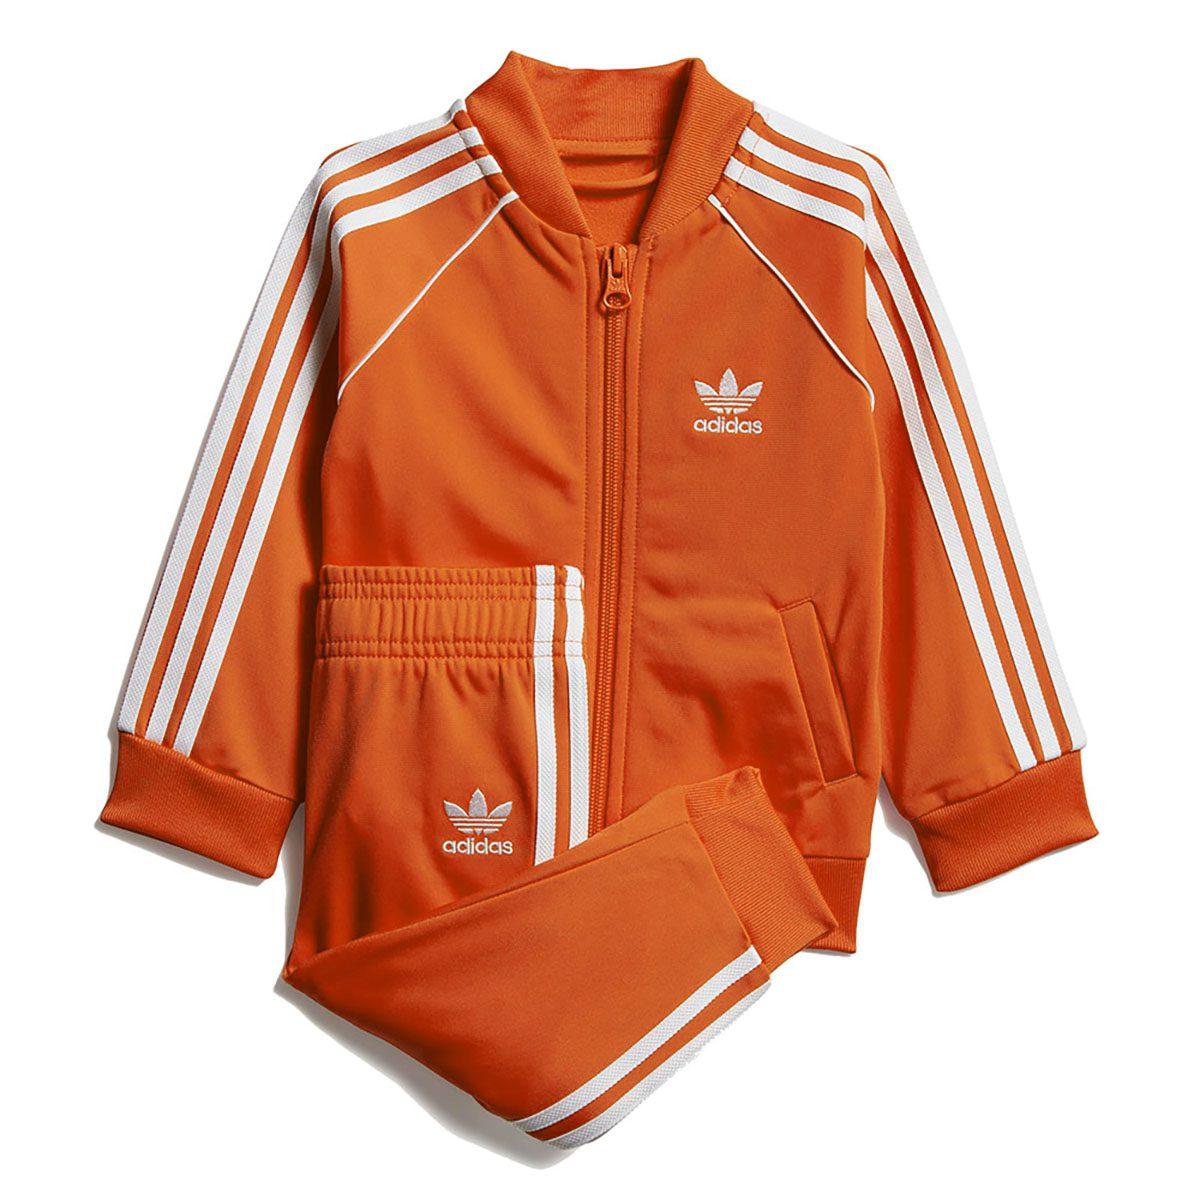 Adidas Originals Infants SST Track Suit